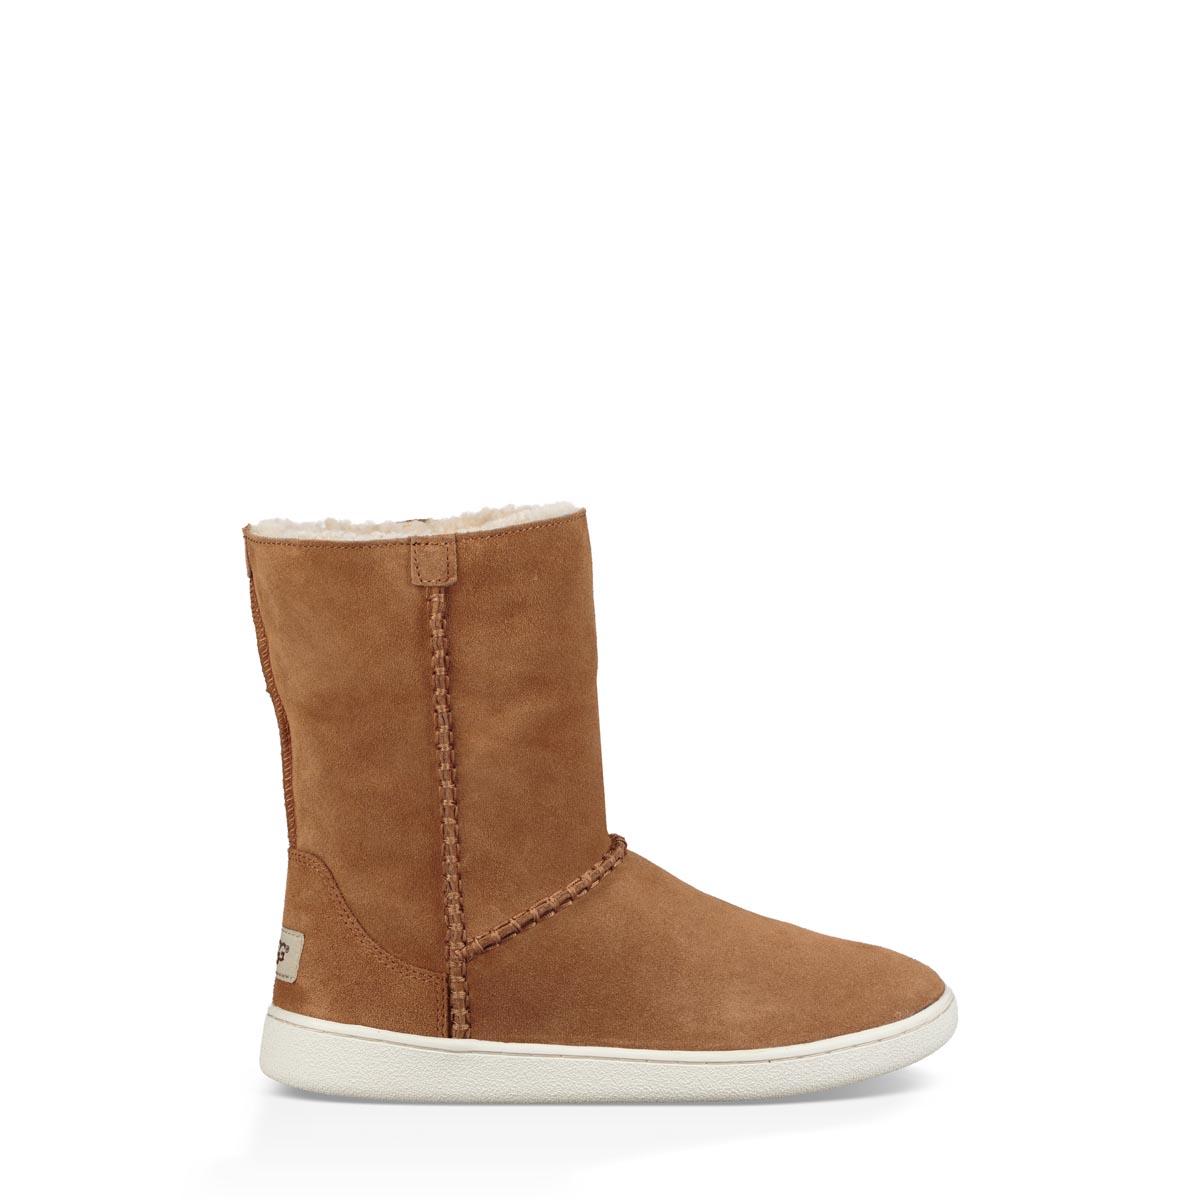 40d590453b9 Women's Mika Classic Sneaker